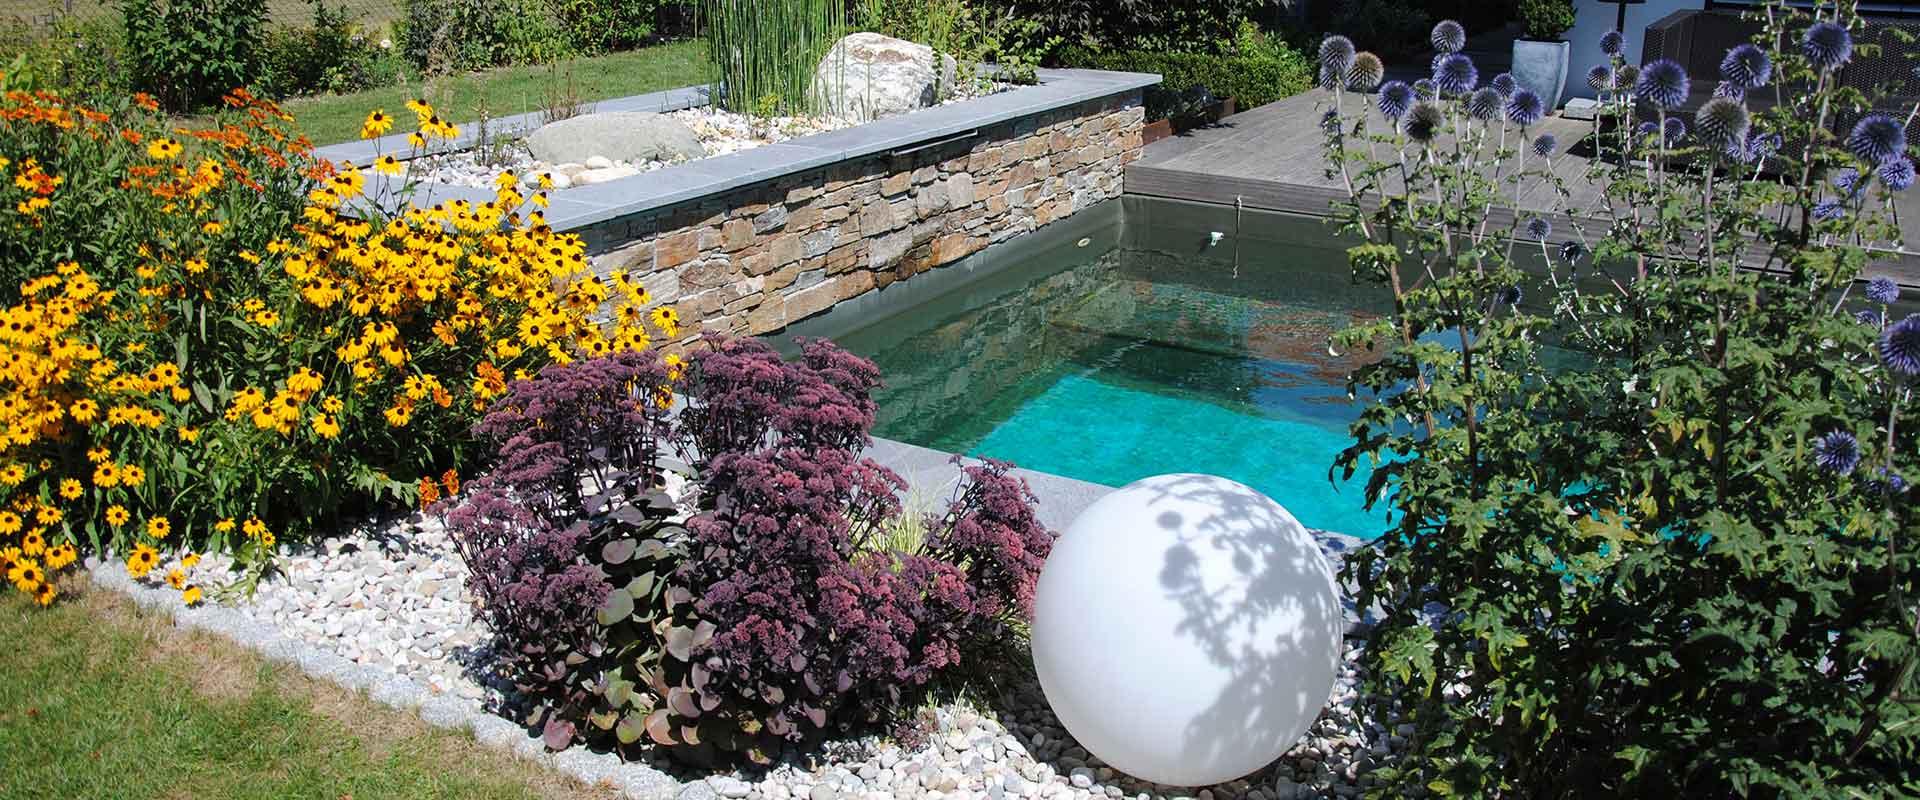 martin-haeringer-gartenbau-landschaftsbau-pool-naturpool-header-02